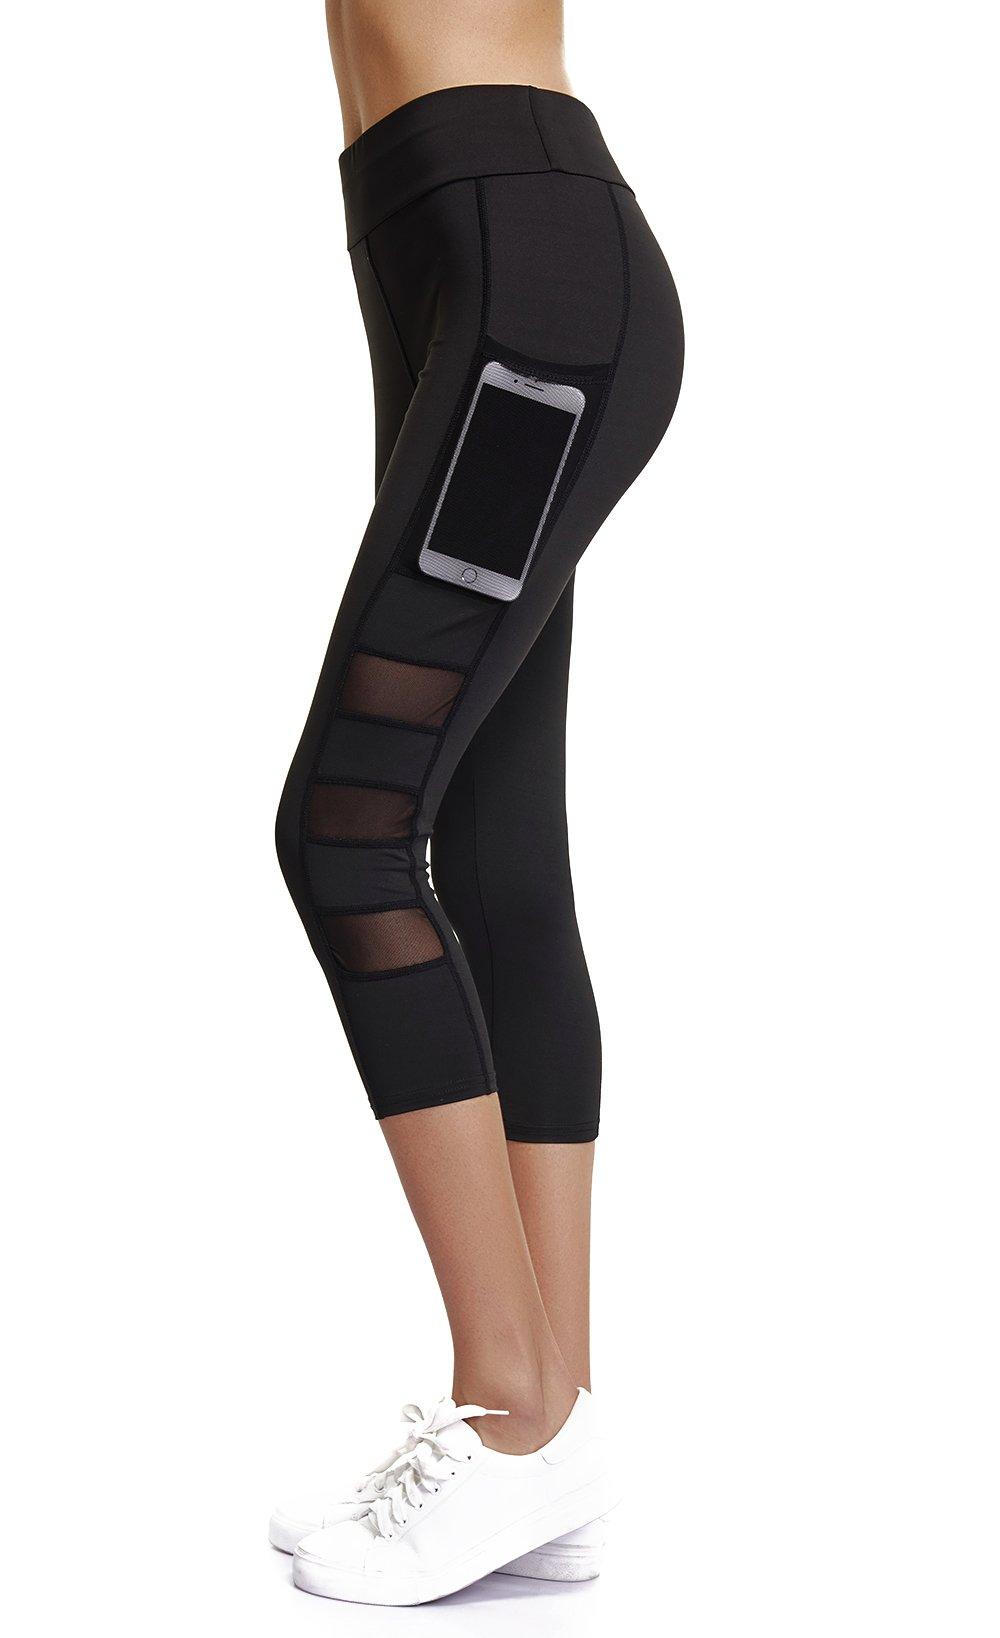 Joyshaper Capri Leggings for Women High Waisted Workout Compression Black Yoga Pants Girls Cropped Tights(Black Capris, L)